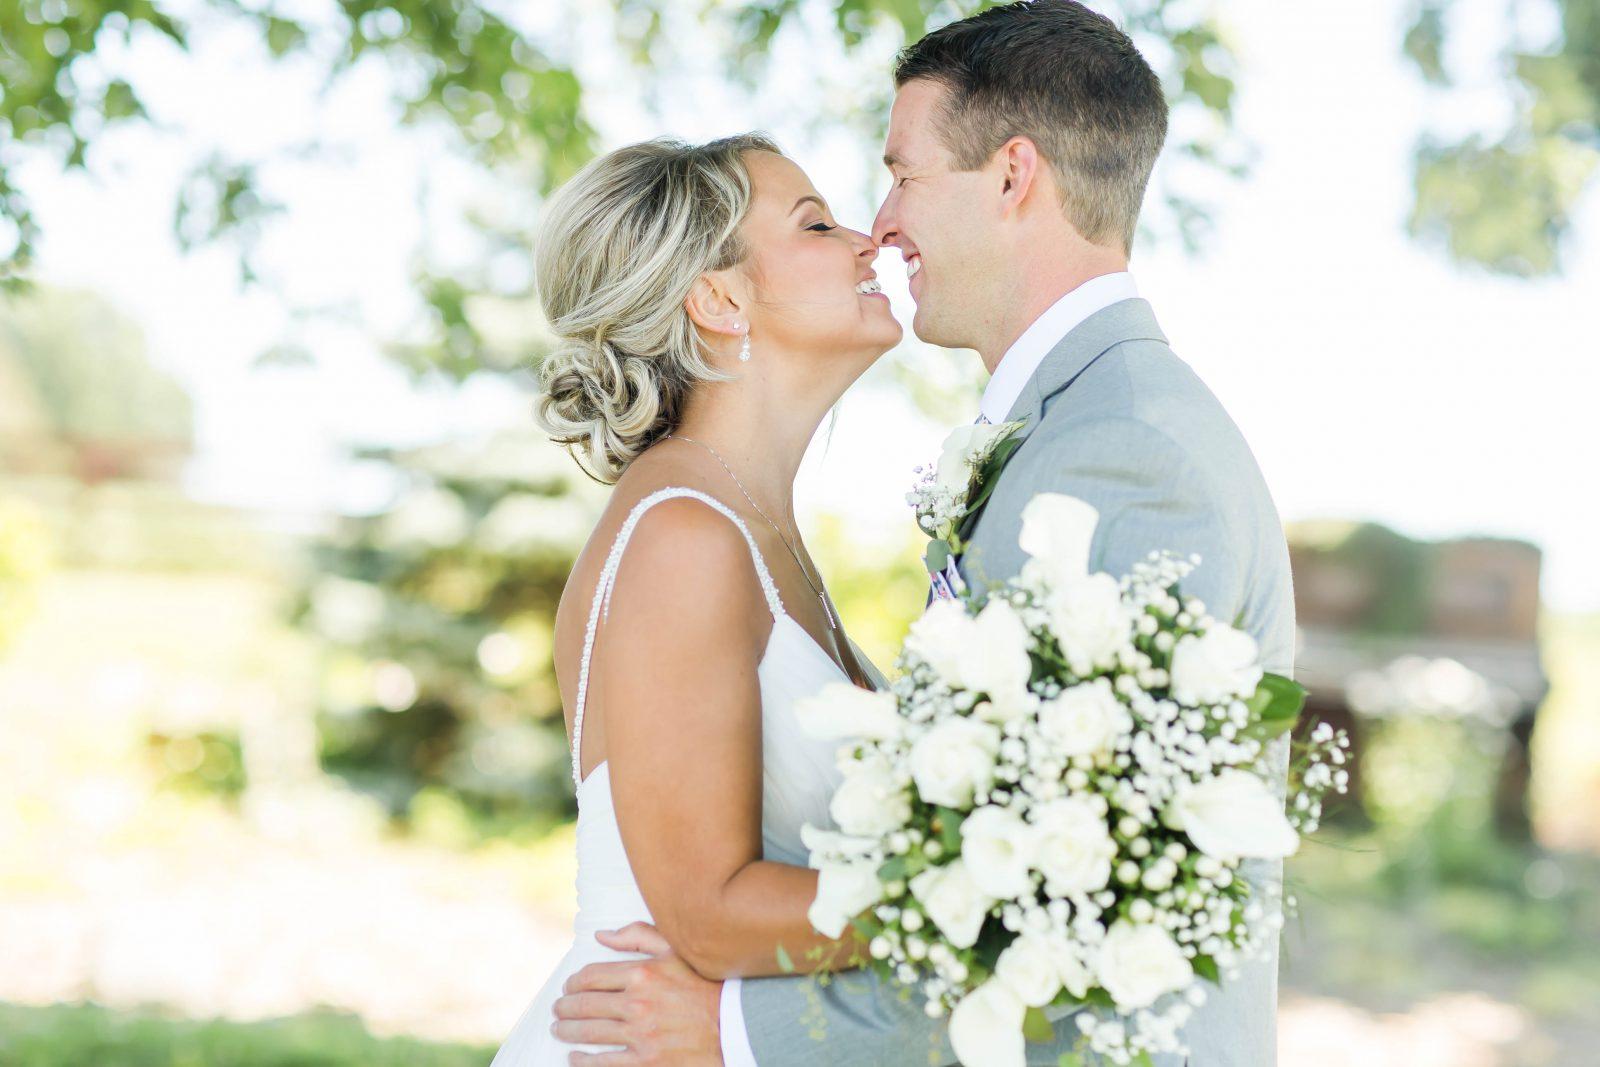 peacock-ridge-summer-wedding-photographer-akron-ohio-loren-jackson-photography-38